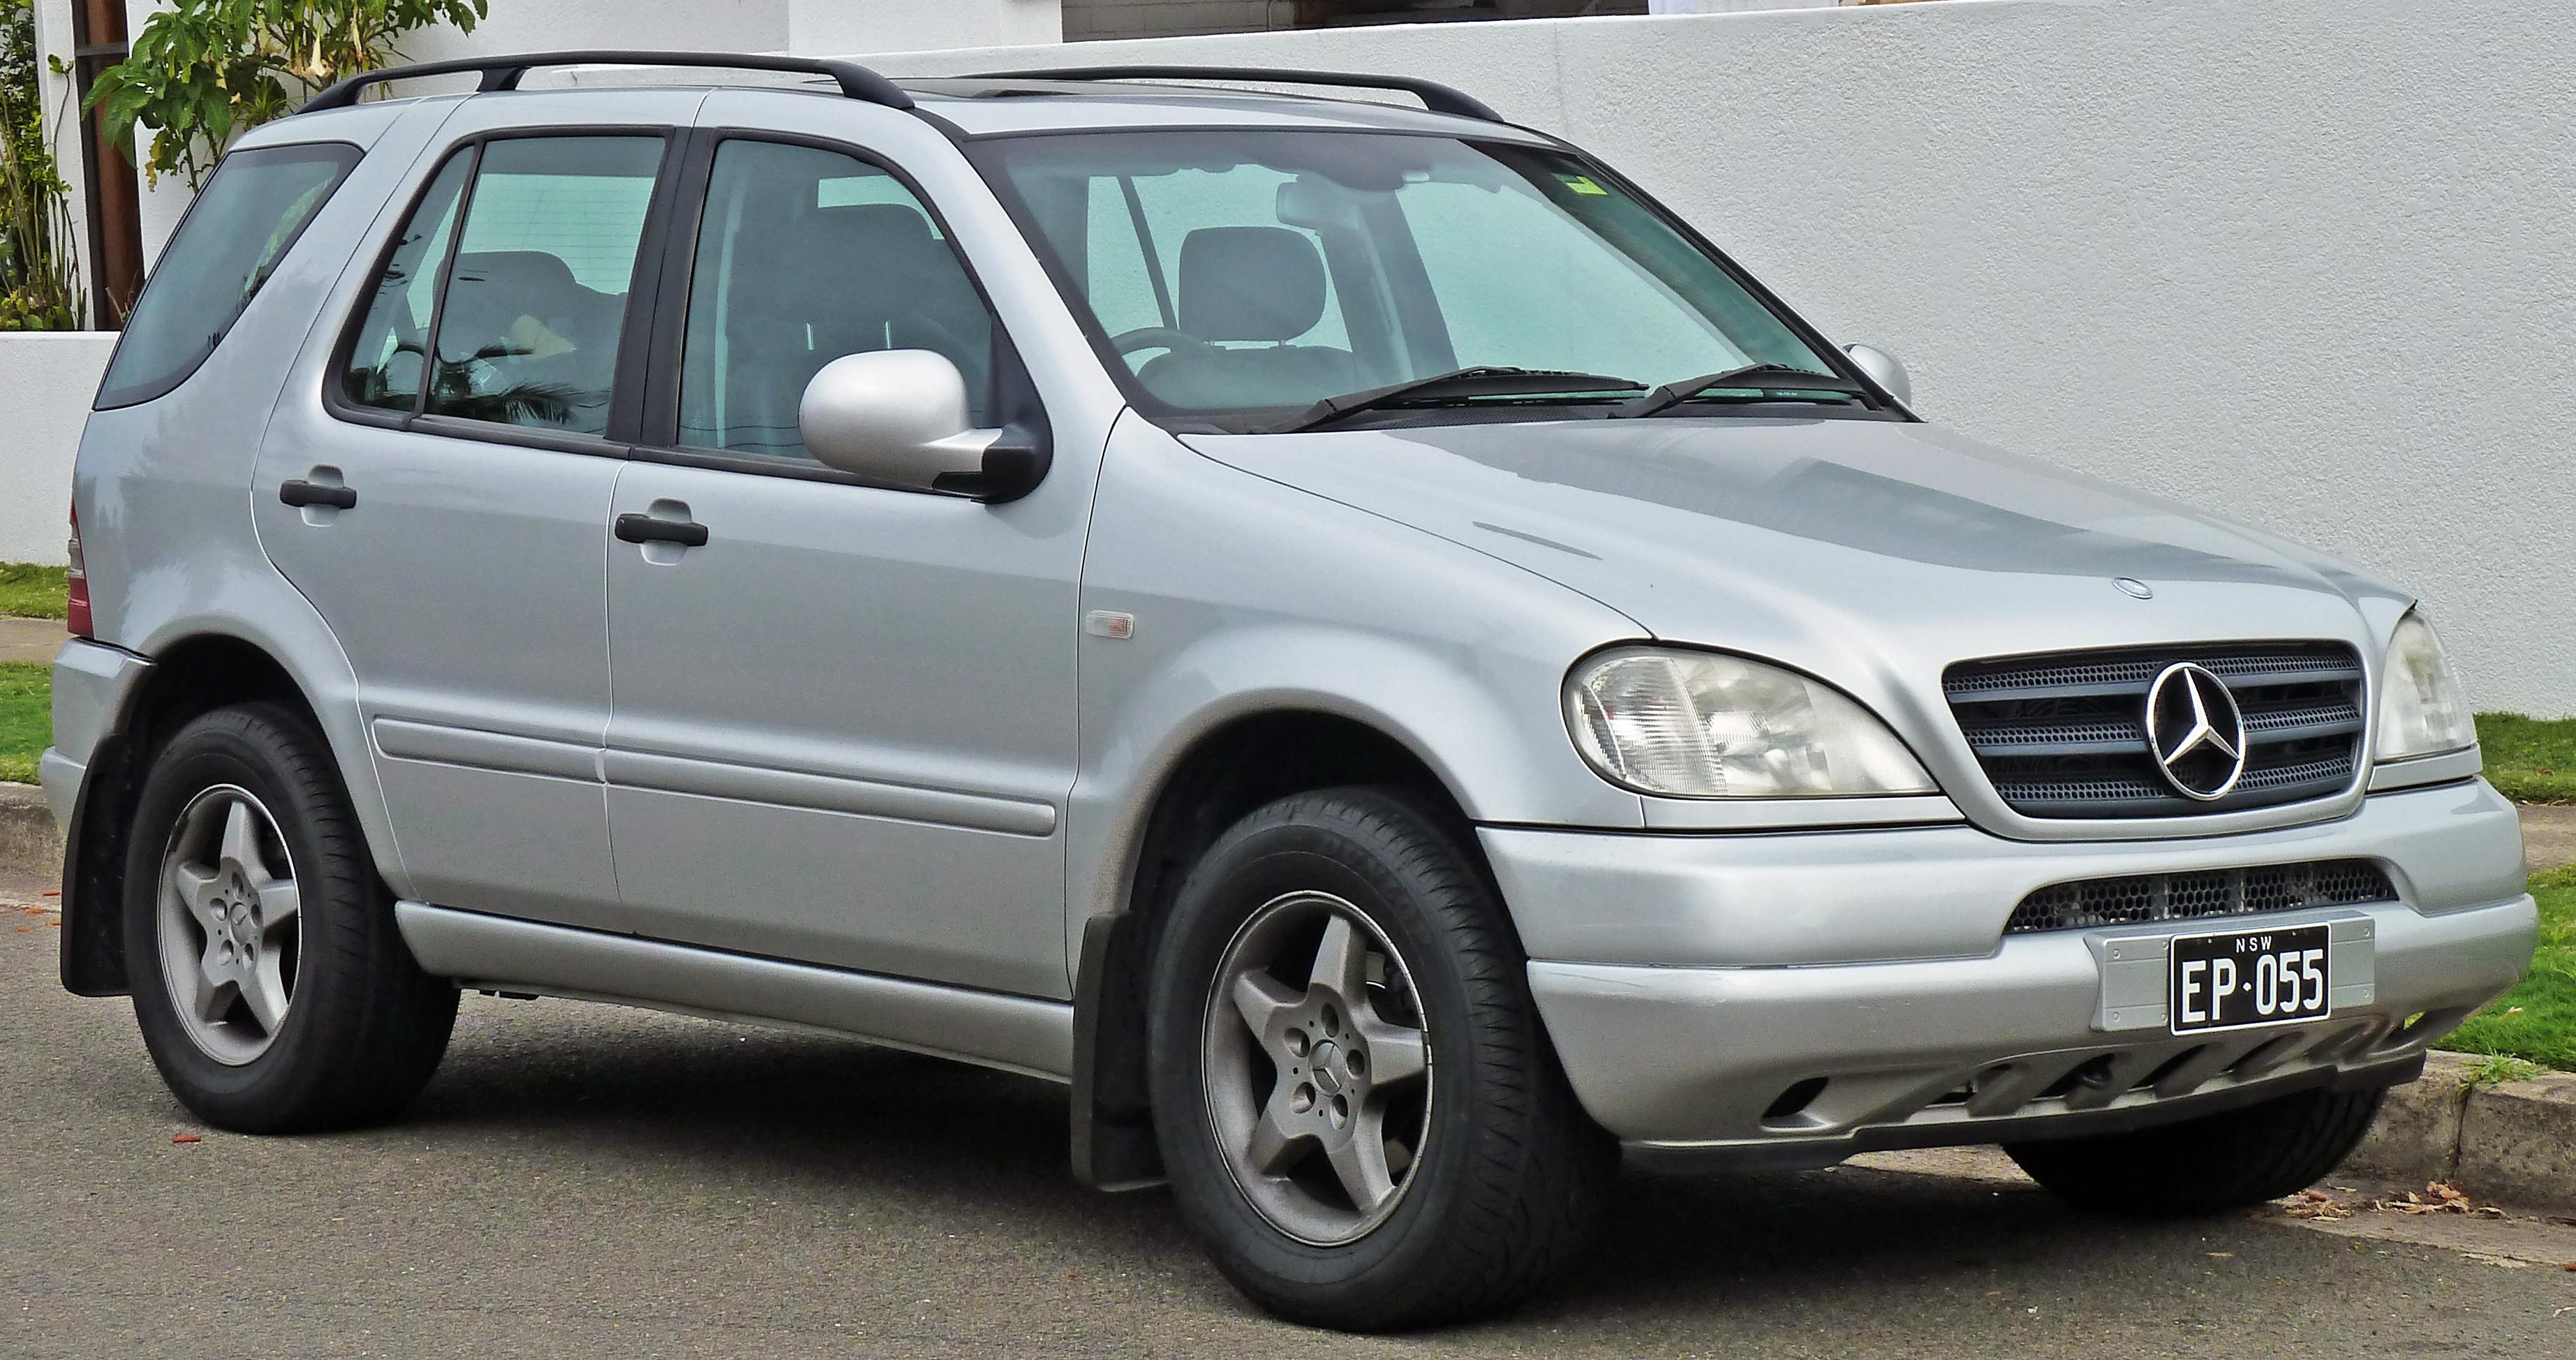 Mercedes-Benz M-klasse AMG I (W163) Restyling 2001 - 2005 SUV 5 door #7